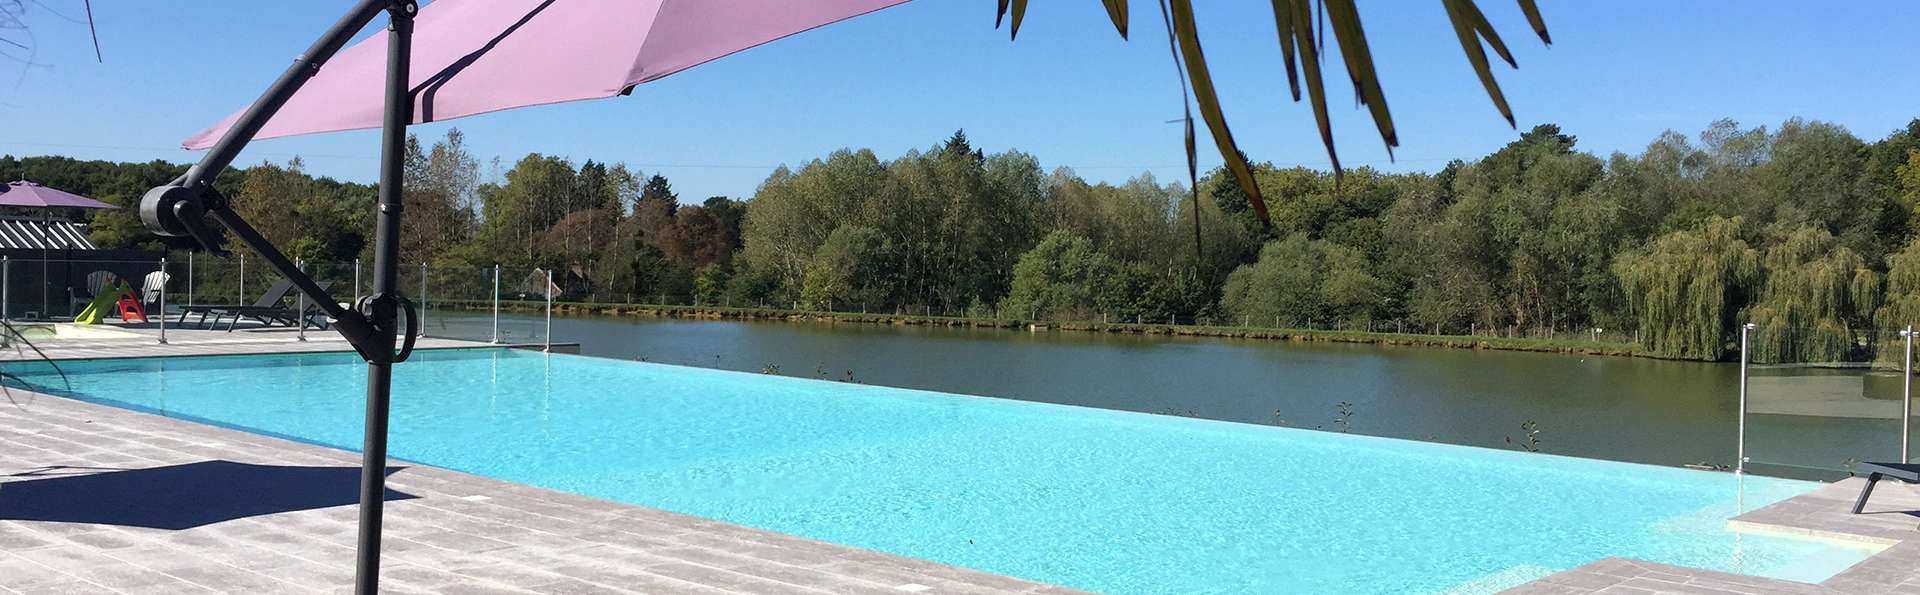 Le Domaine du Grand Bois - EDIT_NEW_Pool.jpg